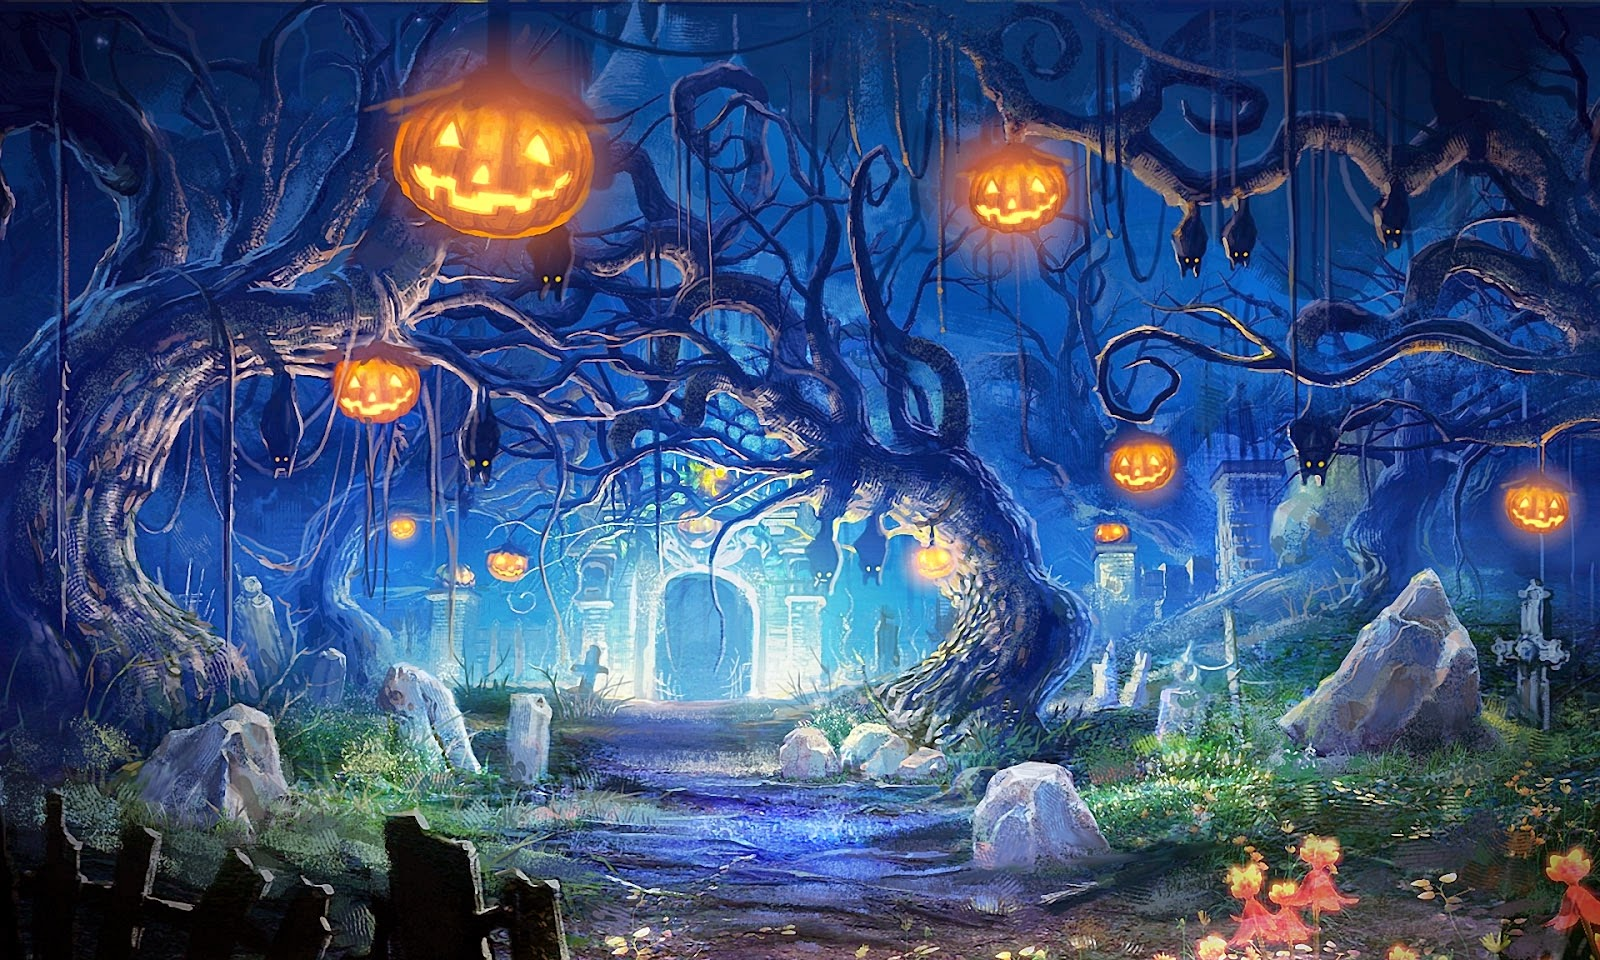 halloween decorations hd wallpaper - photo #34